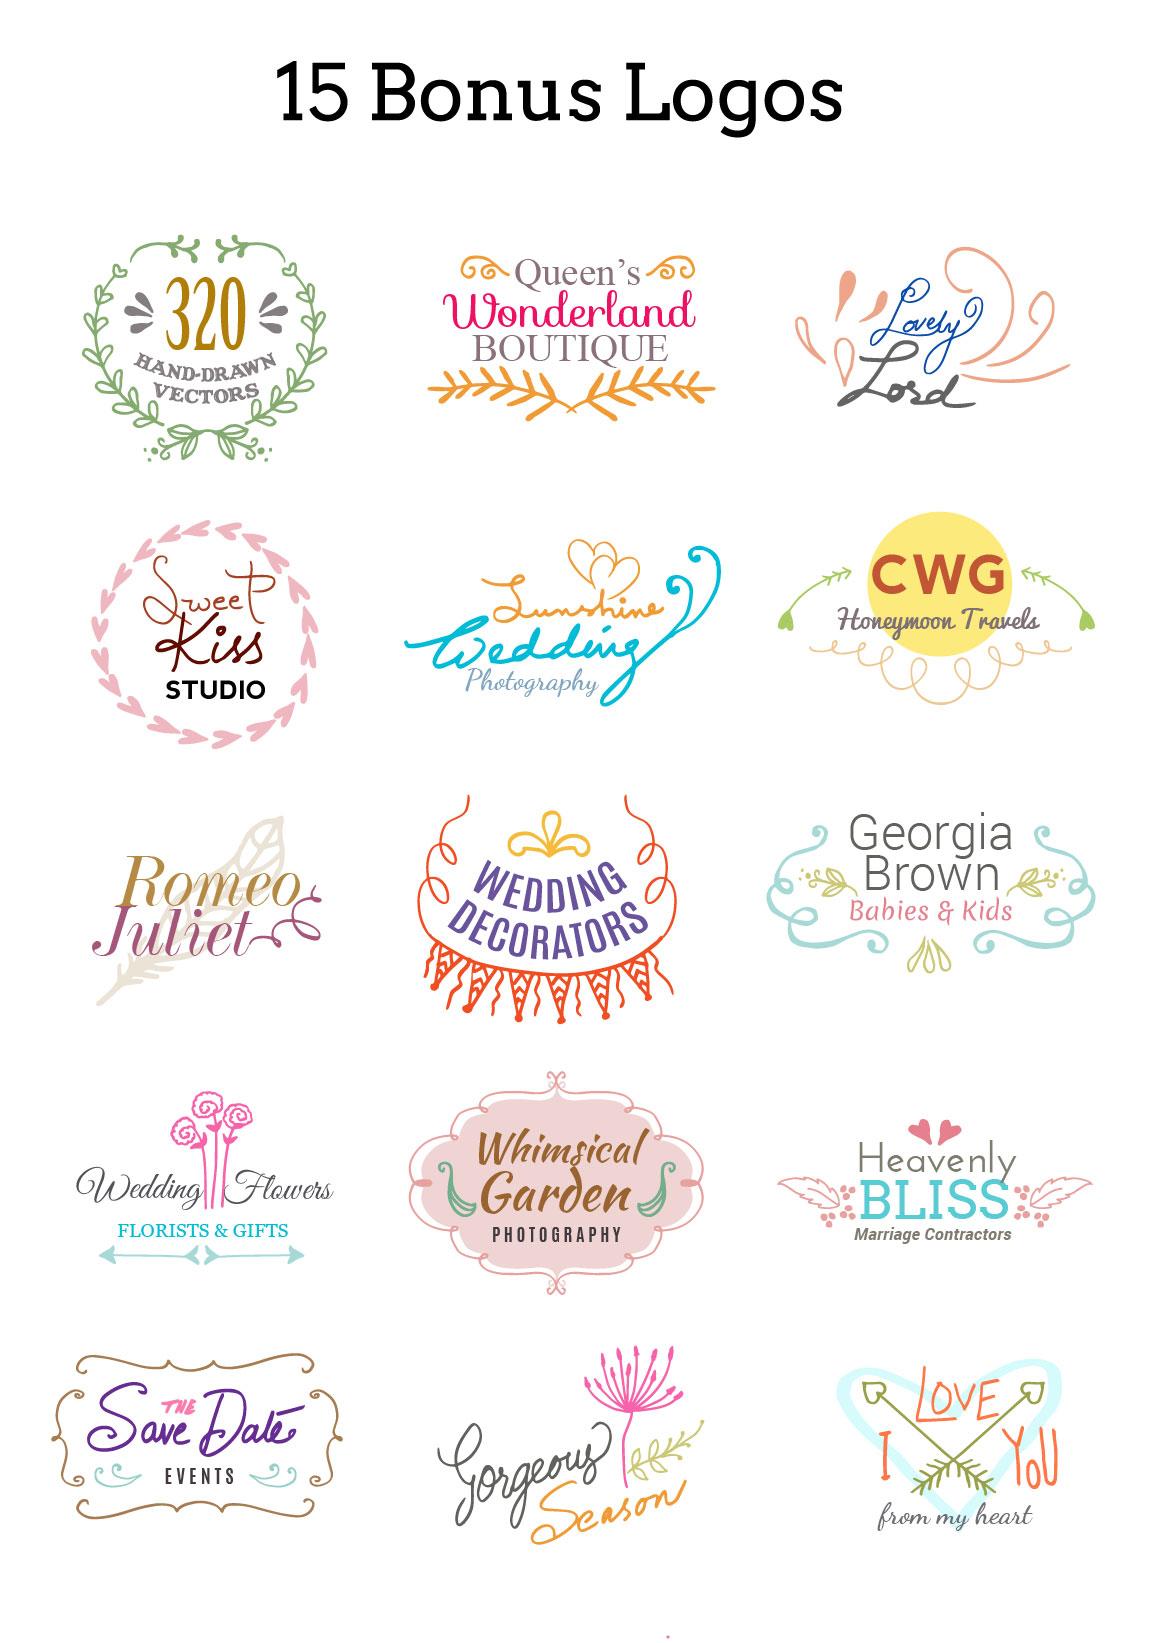 handdrawn-logos